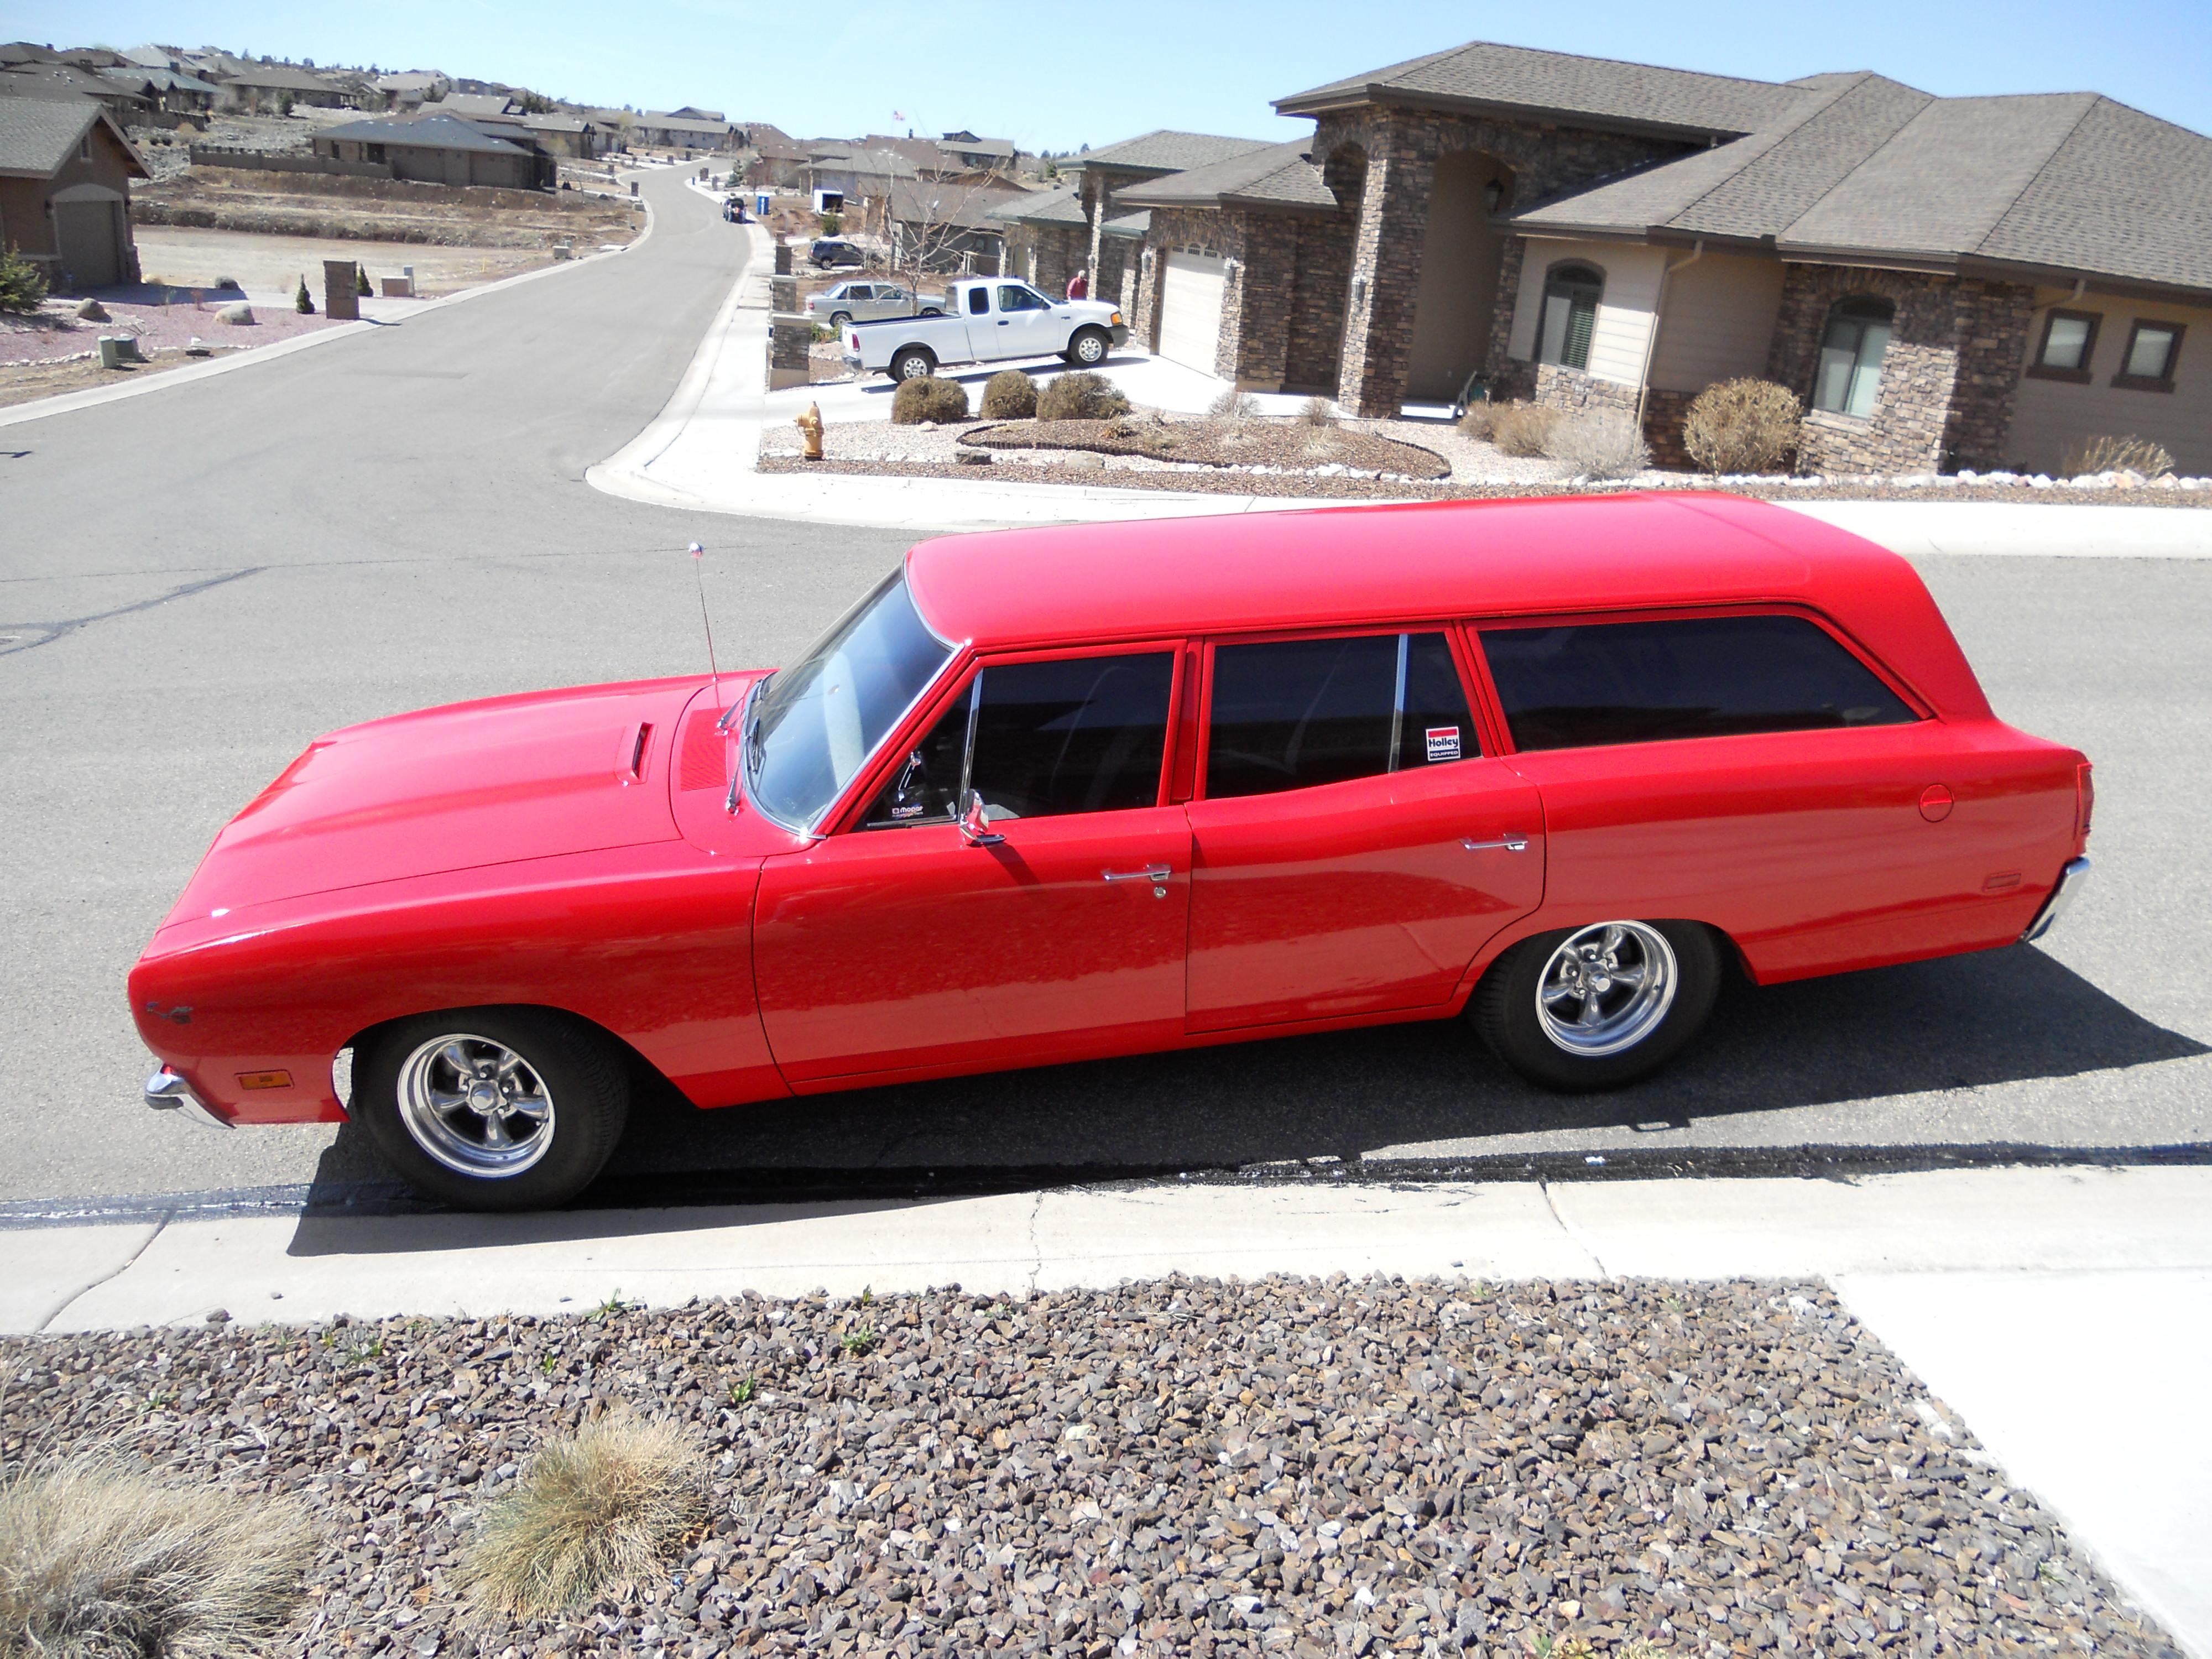 1970 Plymouth Sedan Delivery